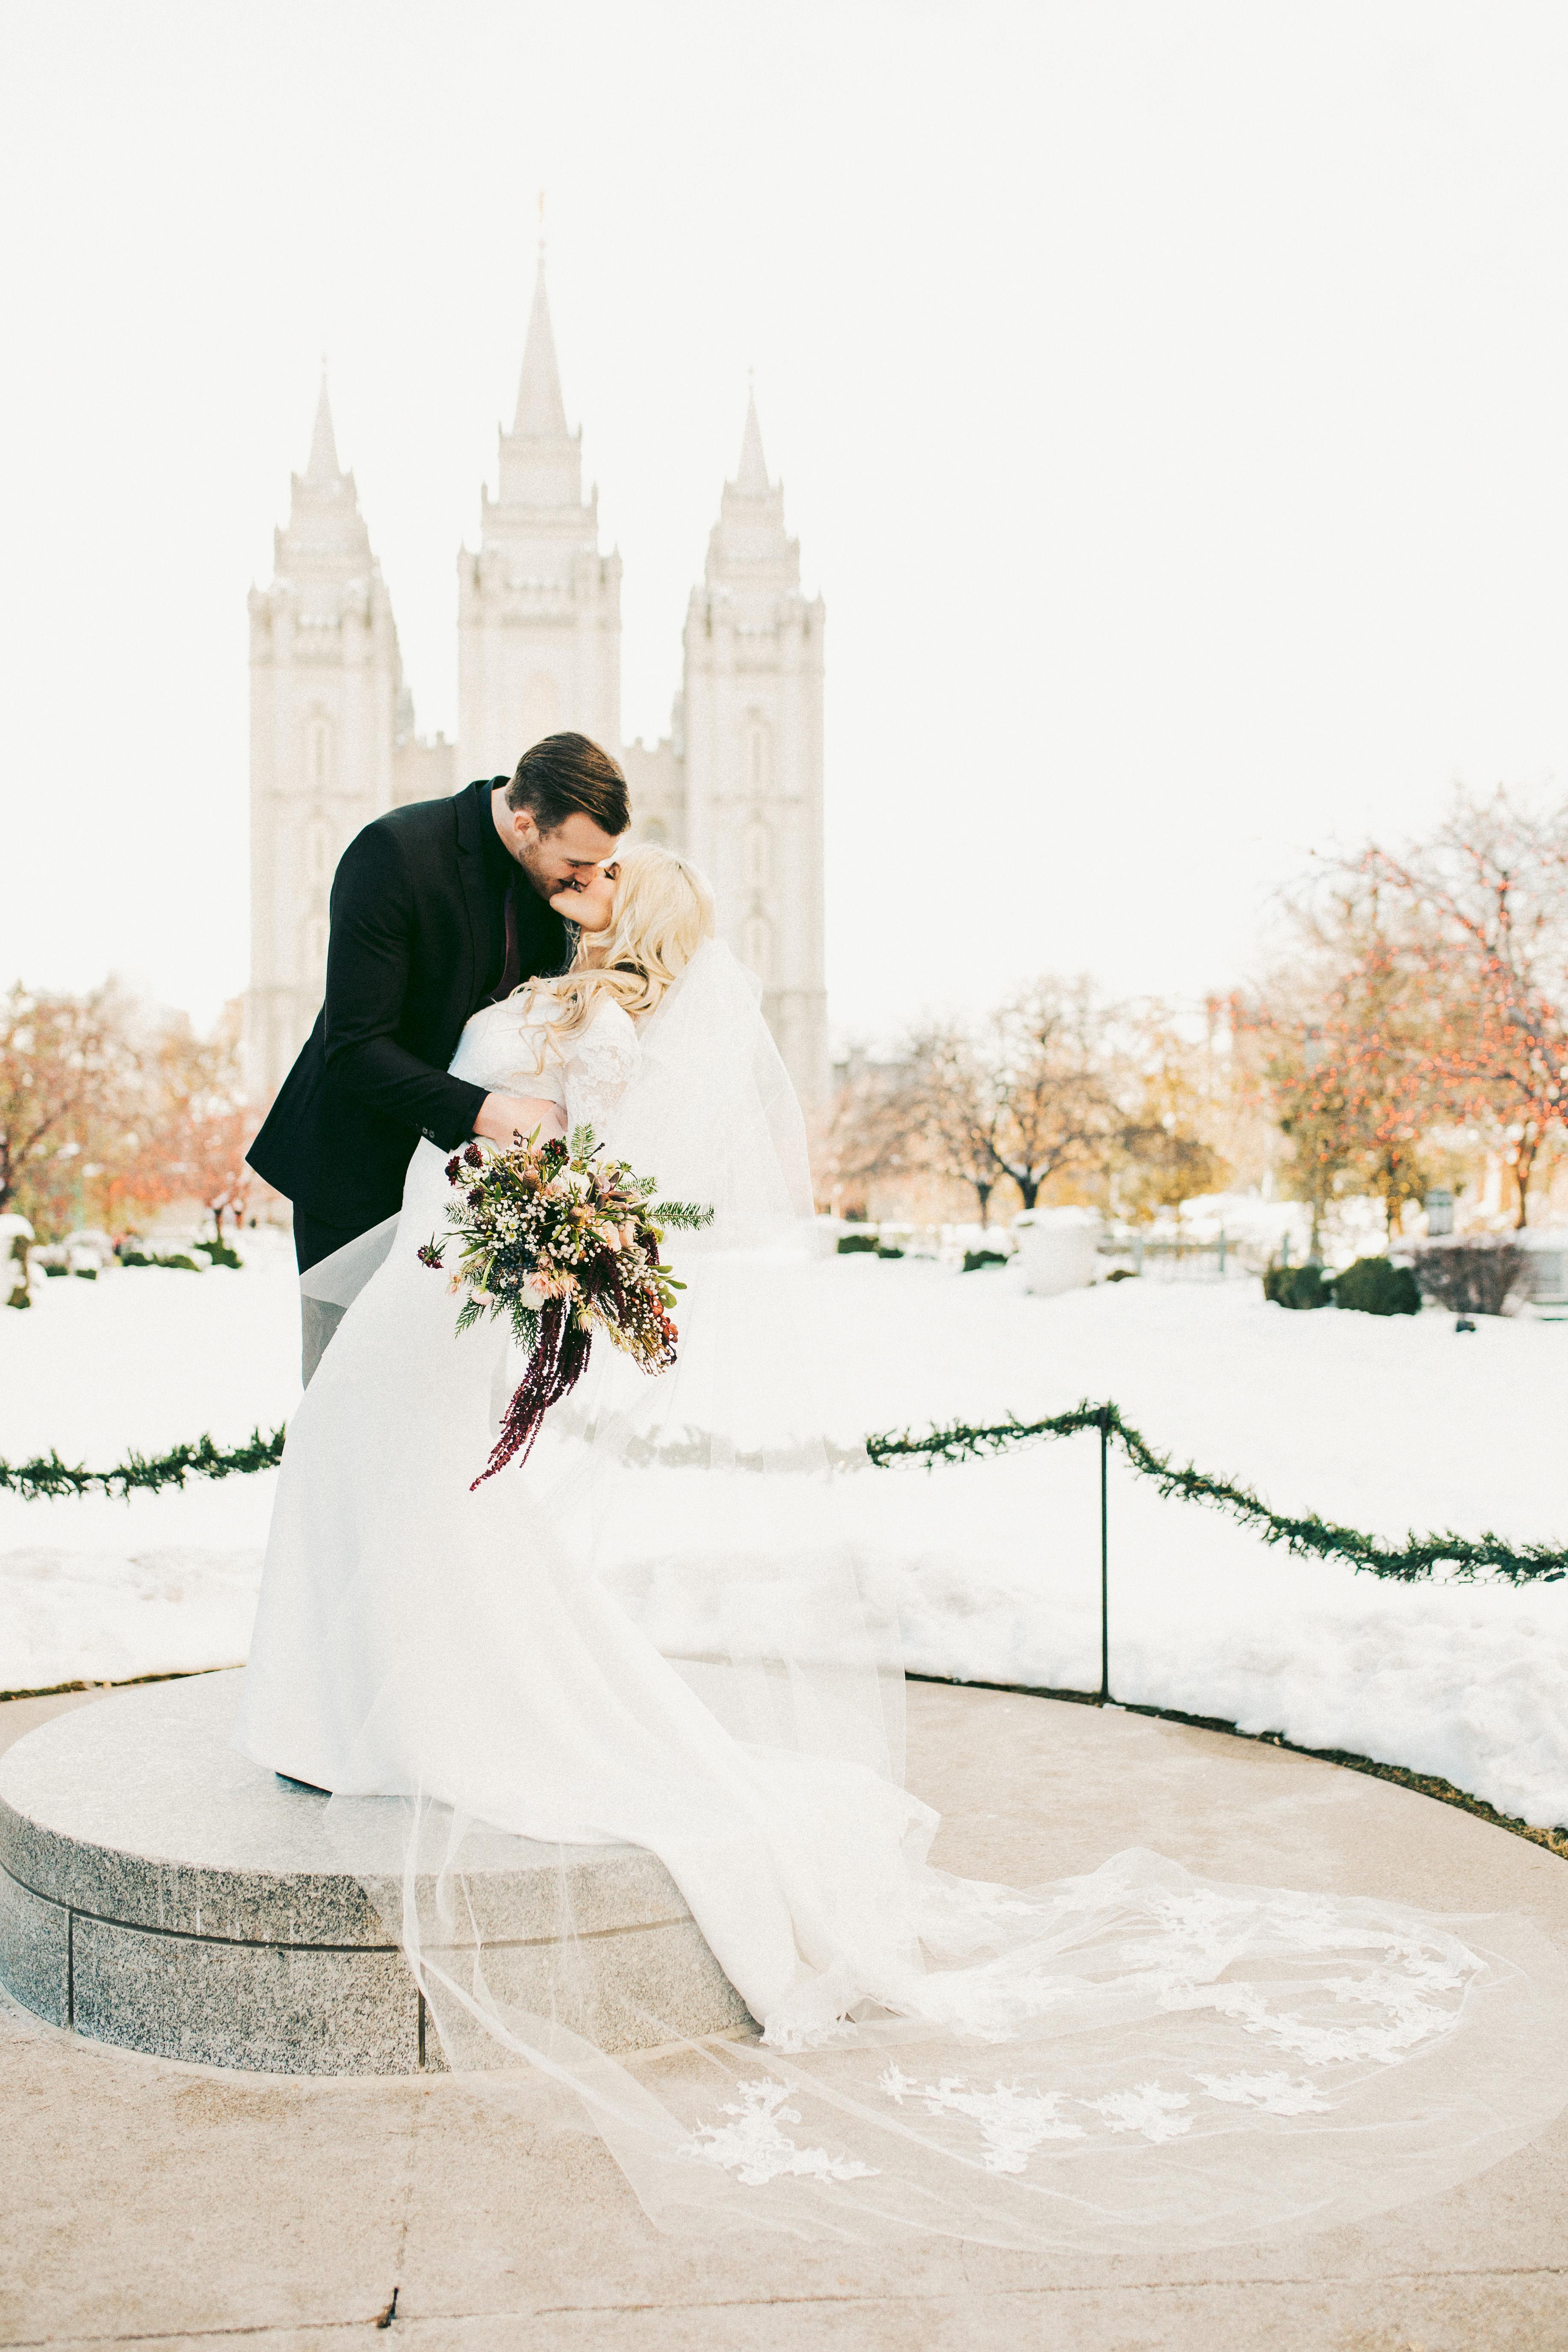 witney_carson_bridals_1238